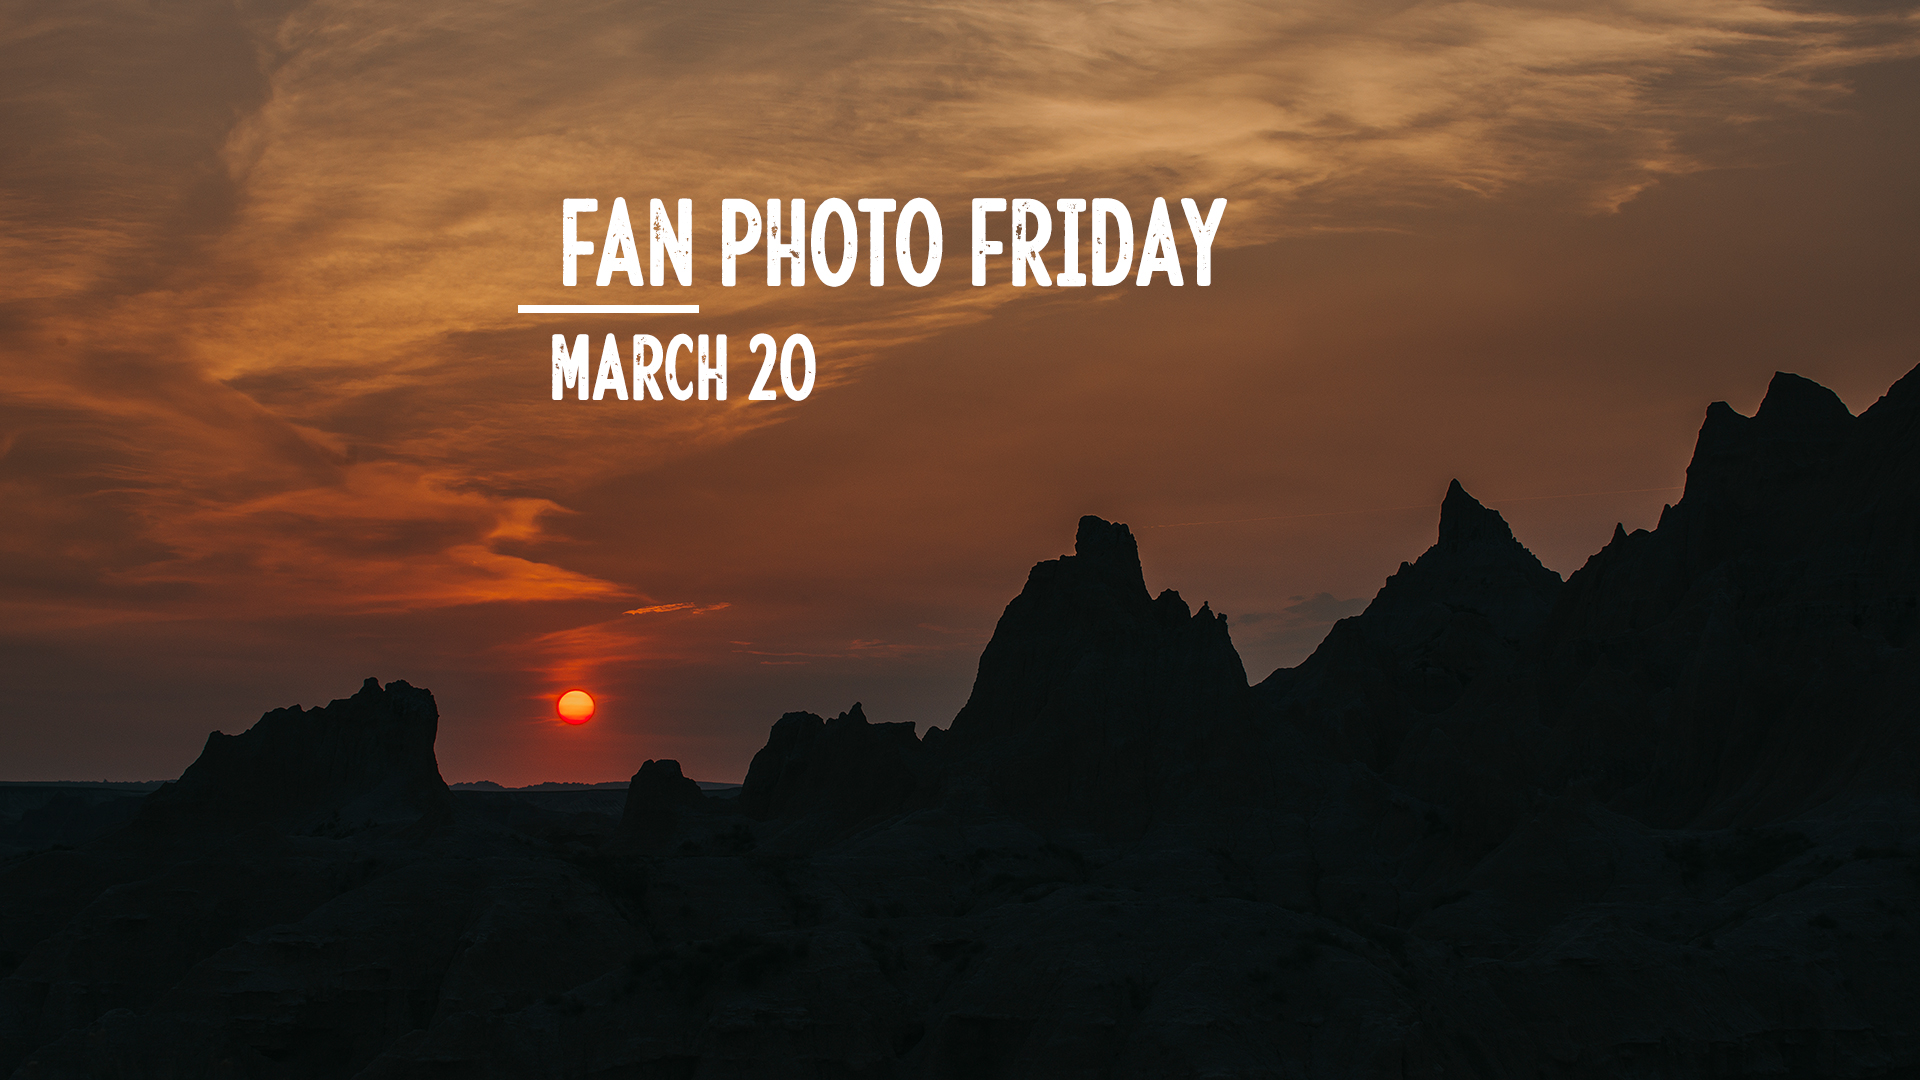 Fan Photo Friday | March 20, 2020